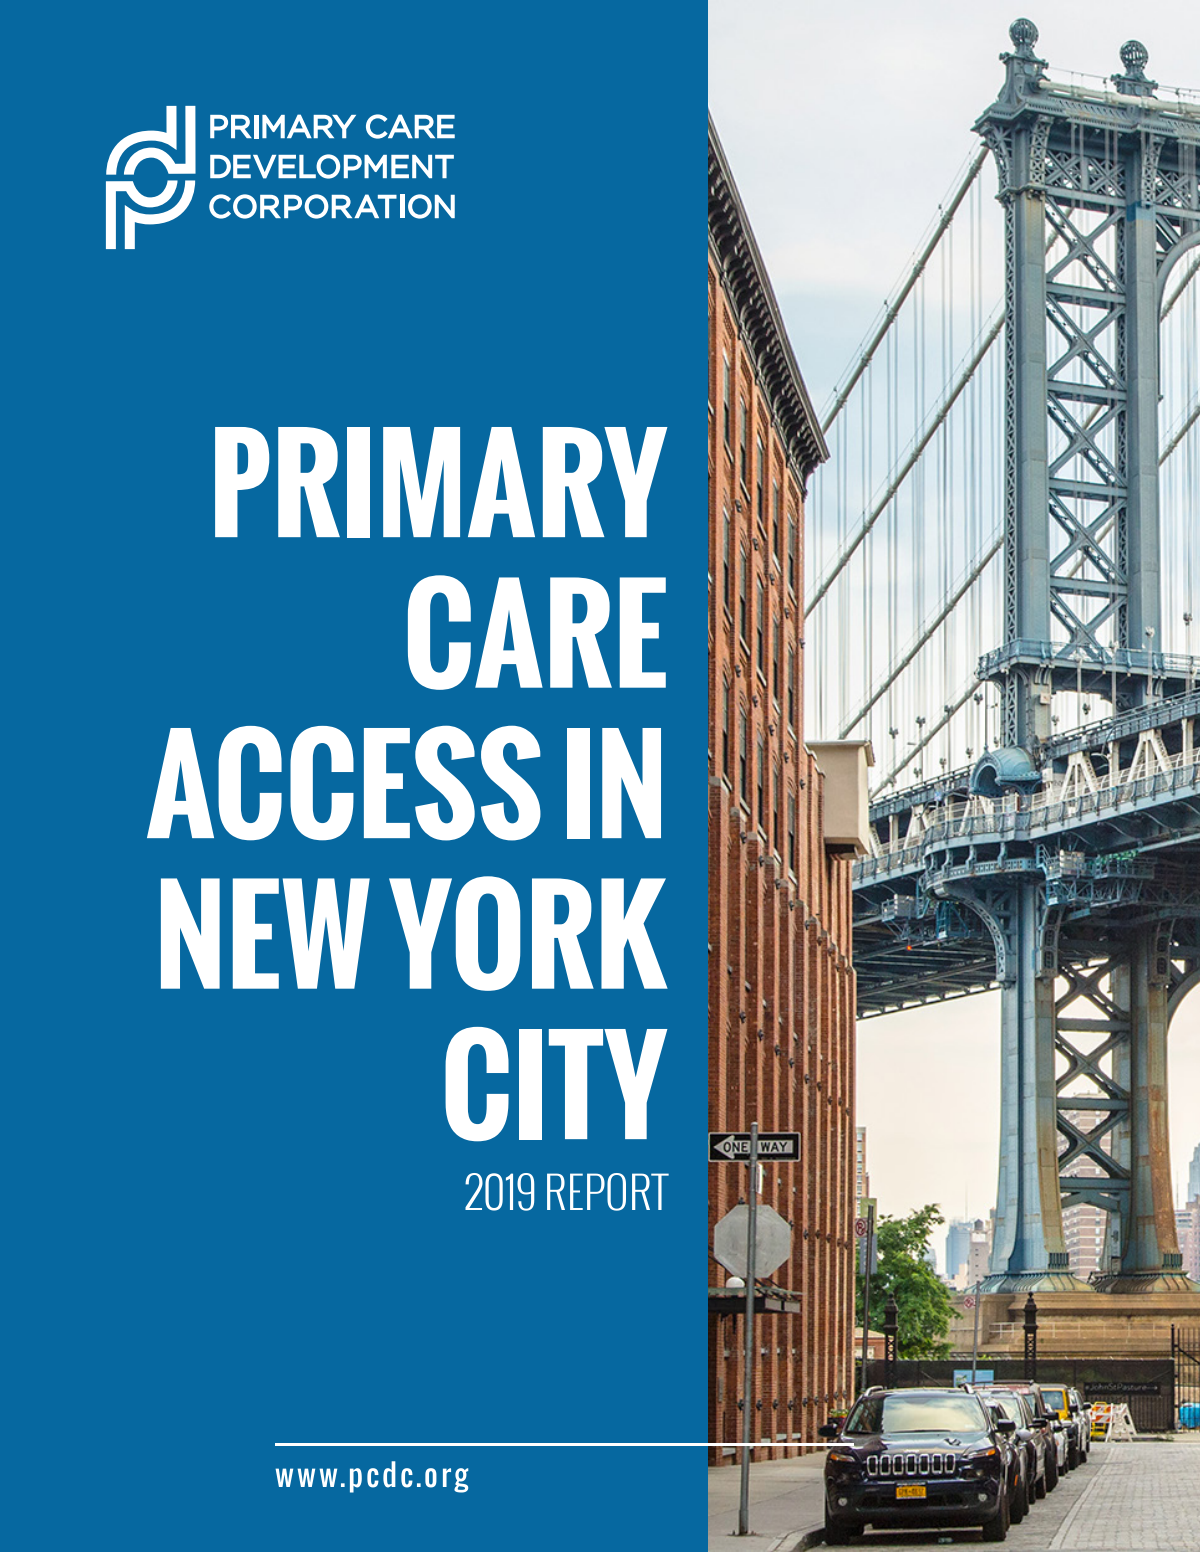 PCDC New York City Report